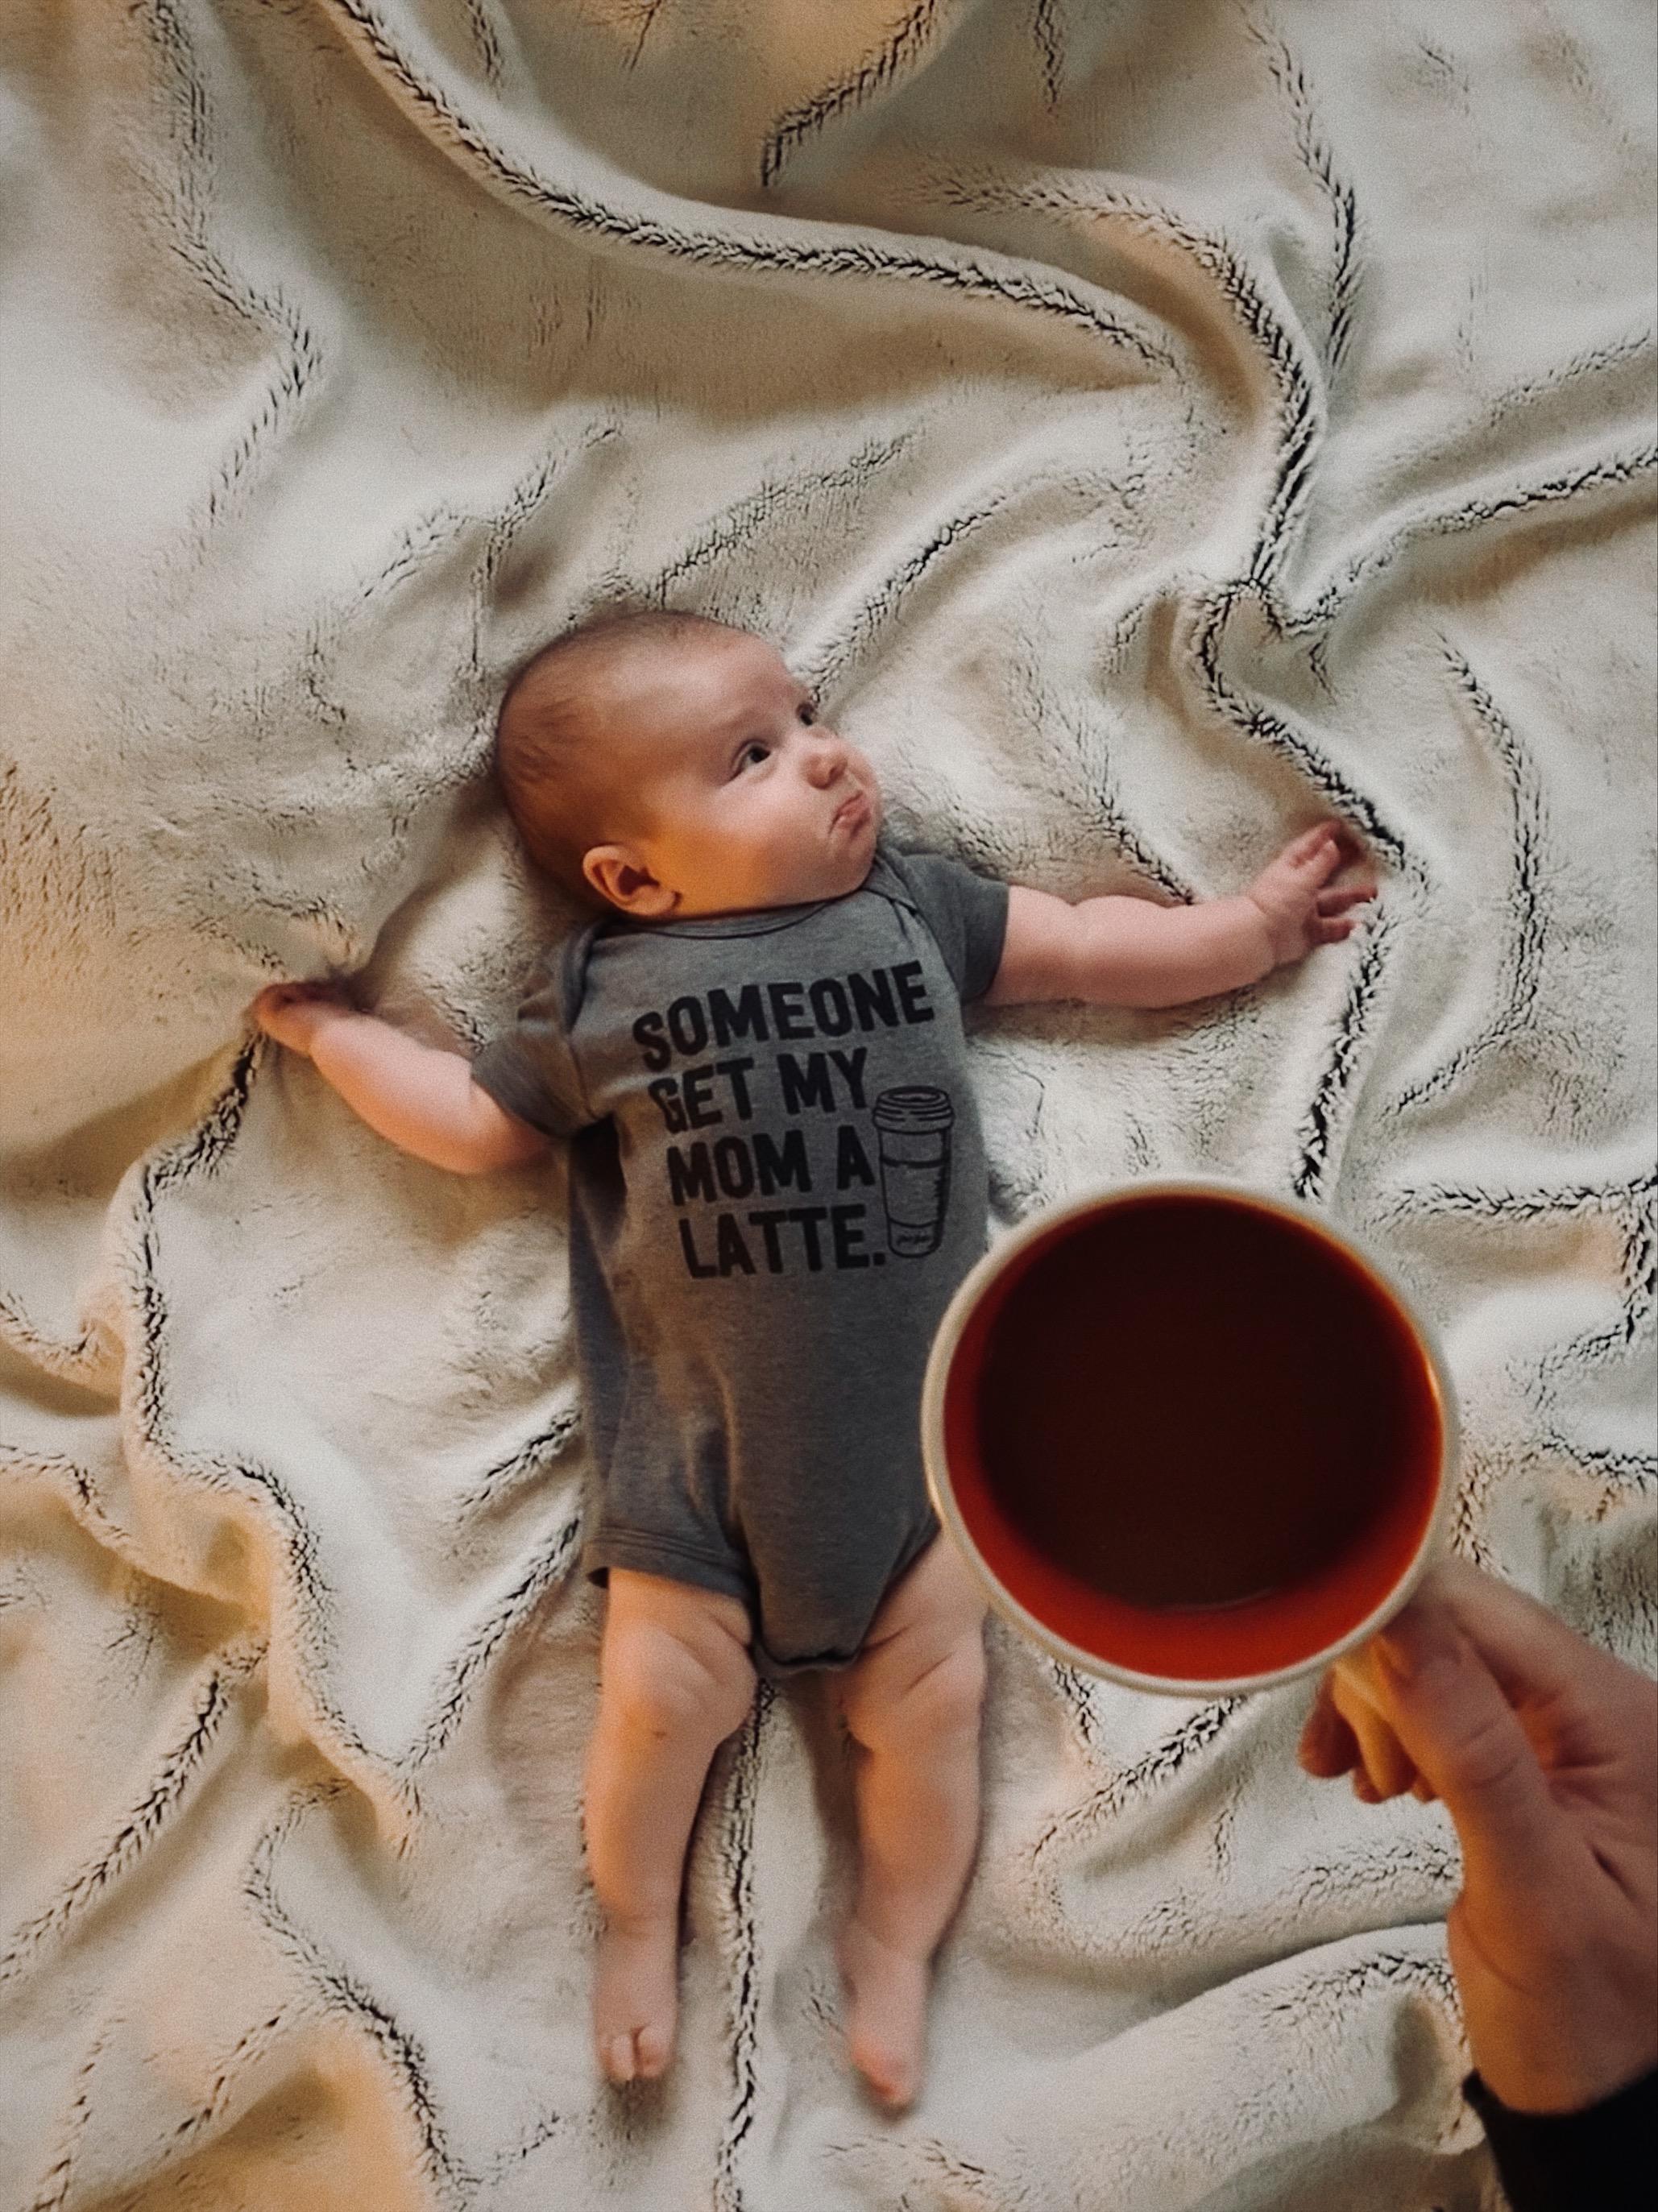 Fueled by caffeine.